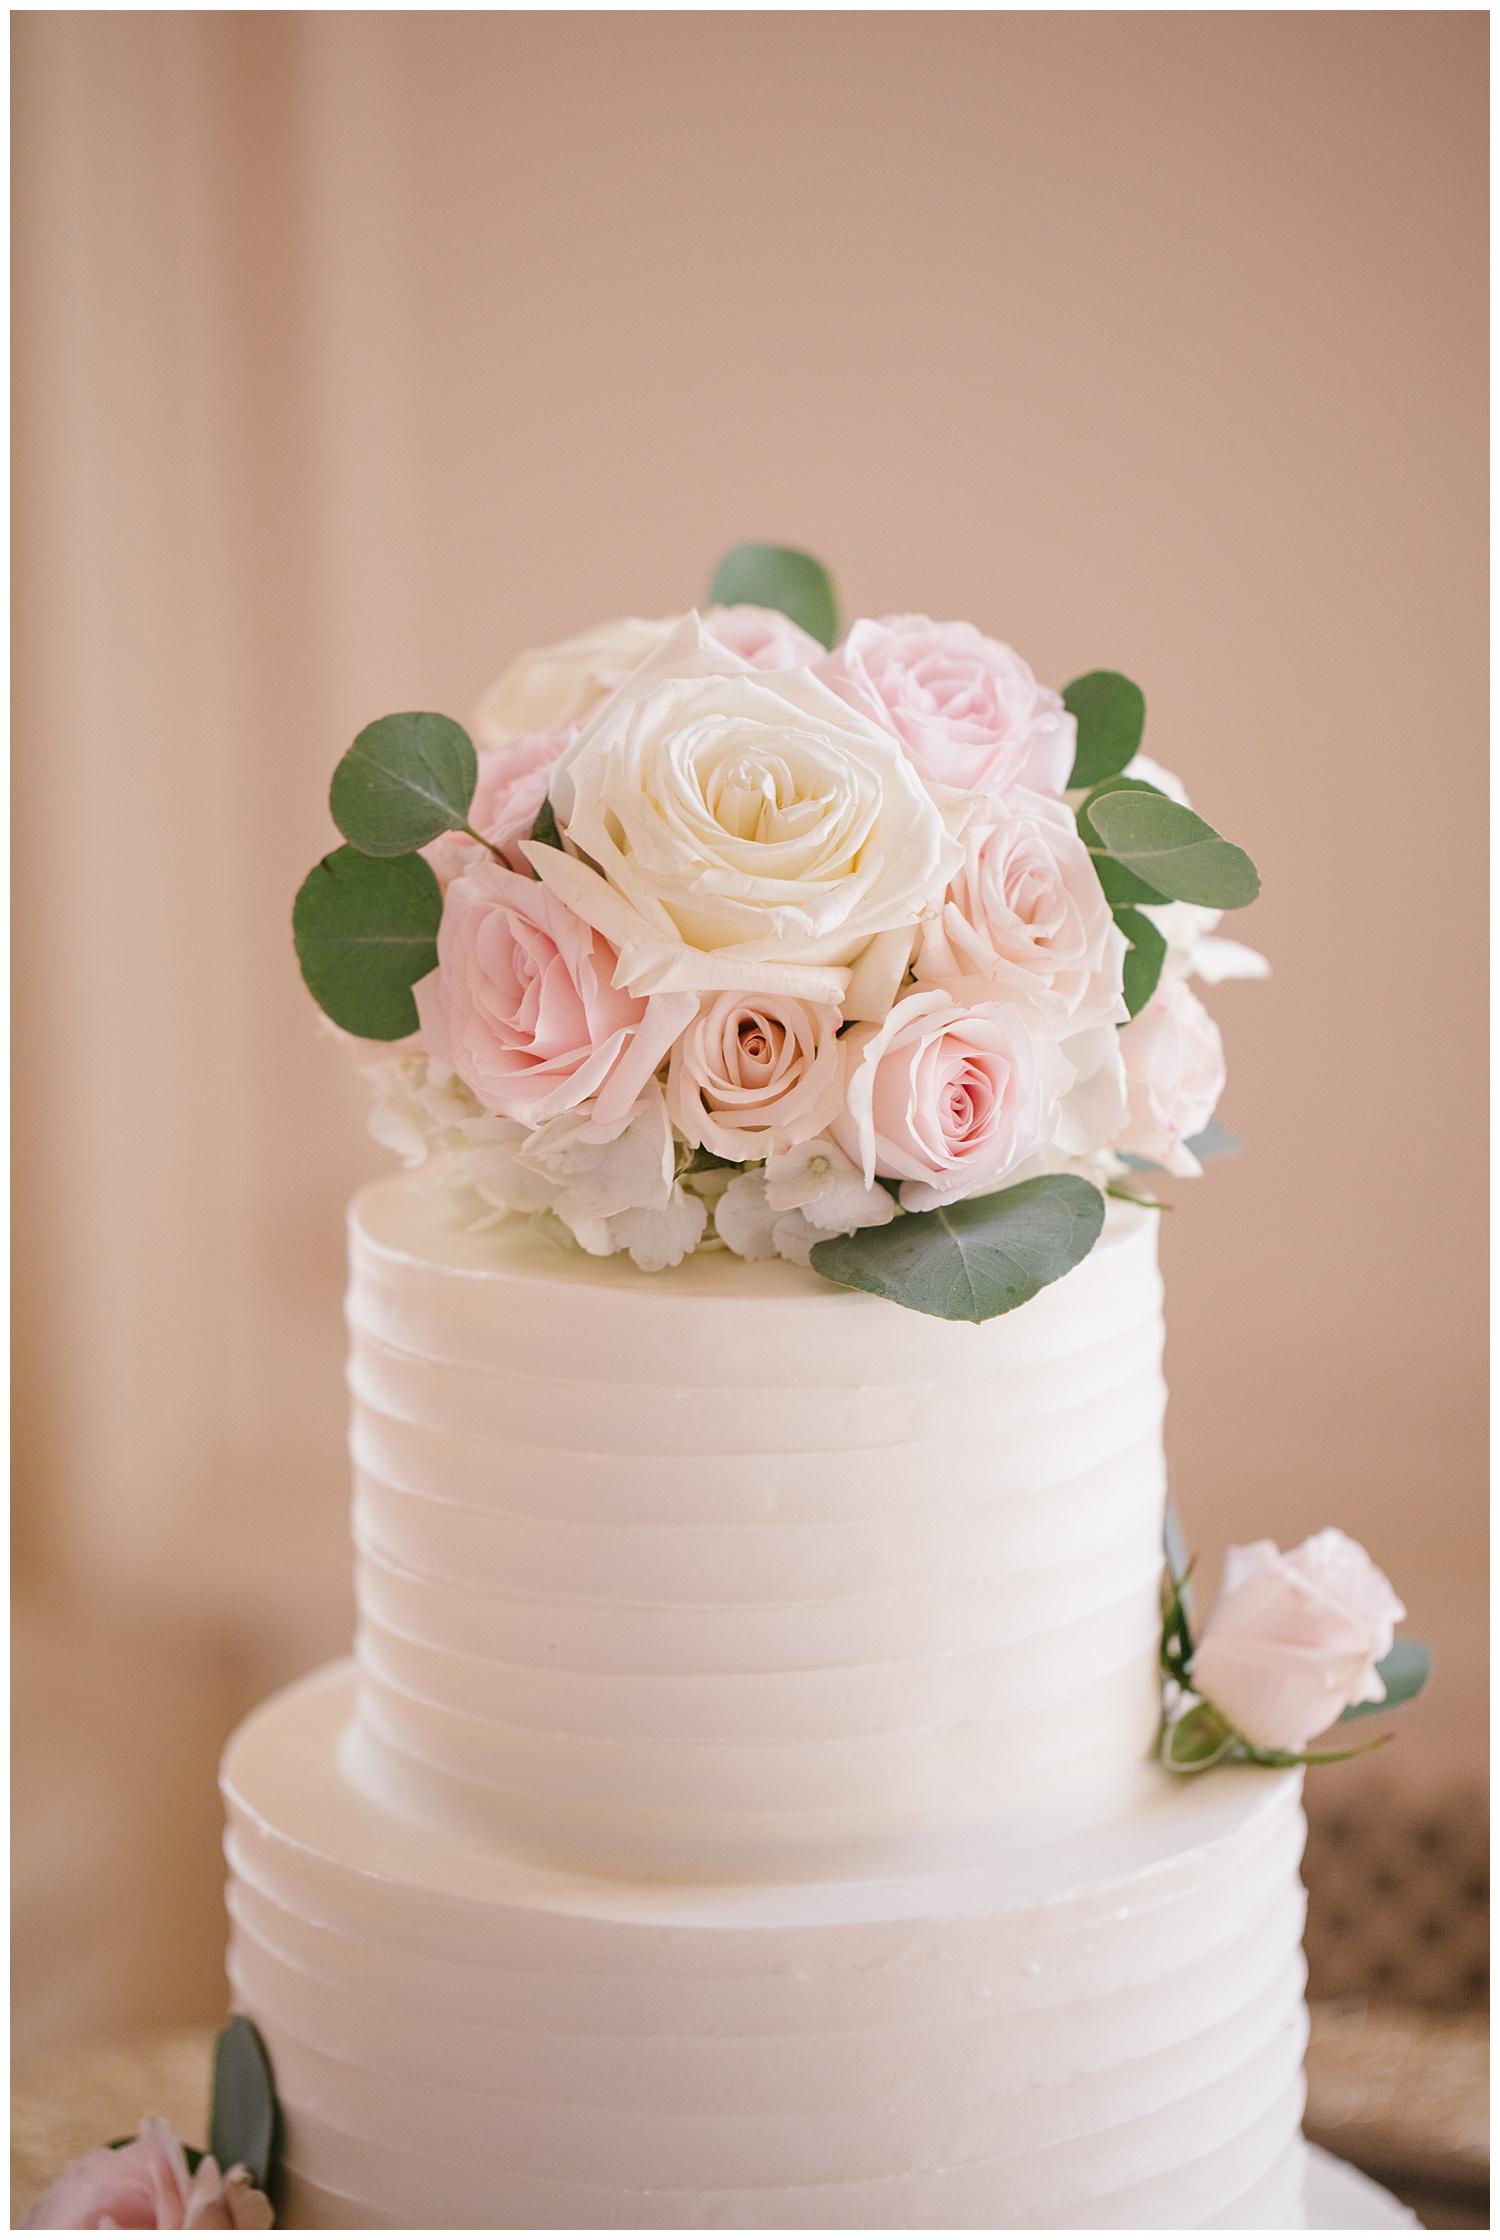 Stephen_Nathalie_Rosecliff_Mansion_Wedding_018.jpeg